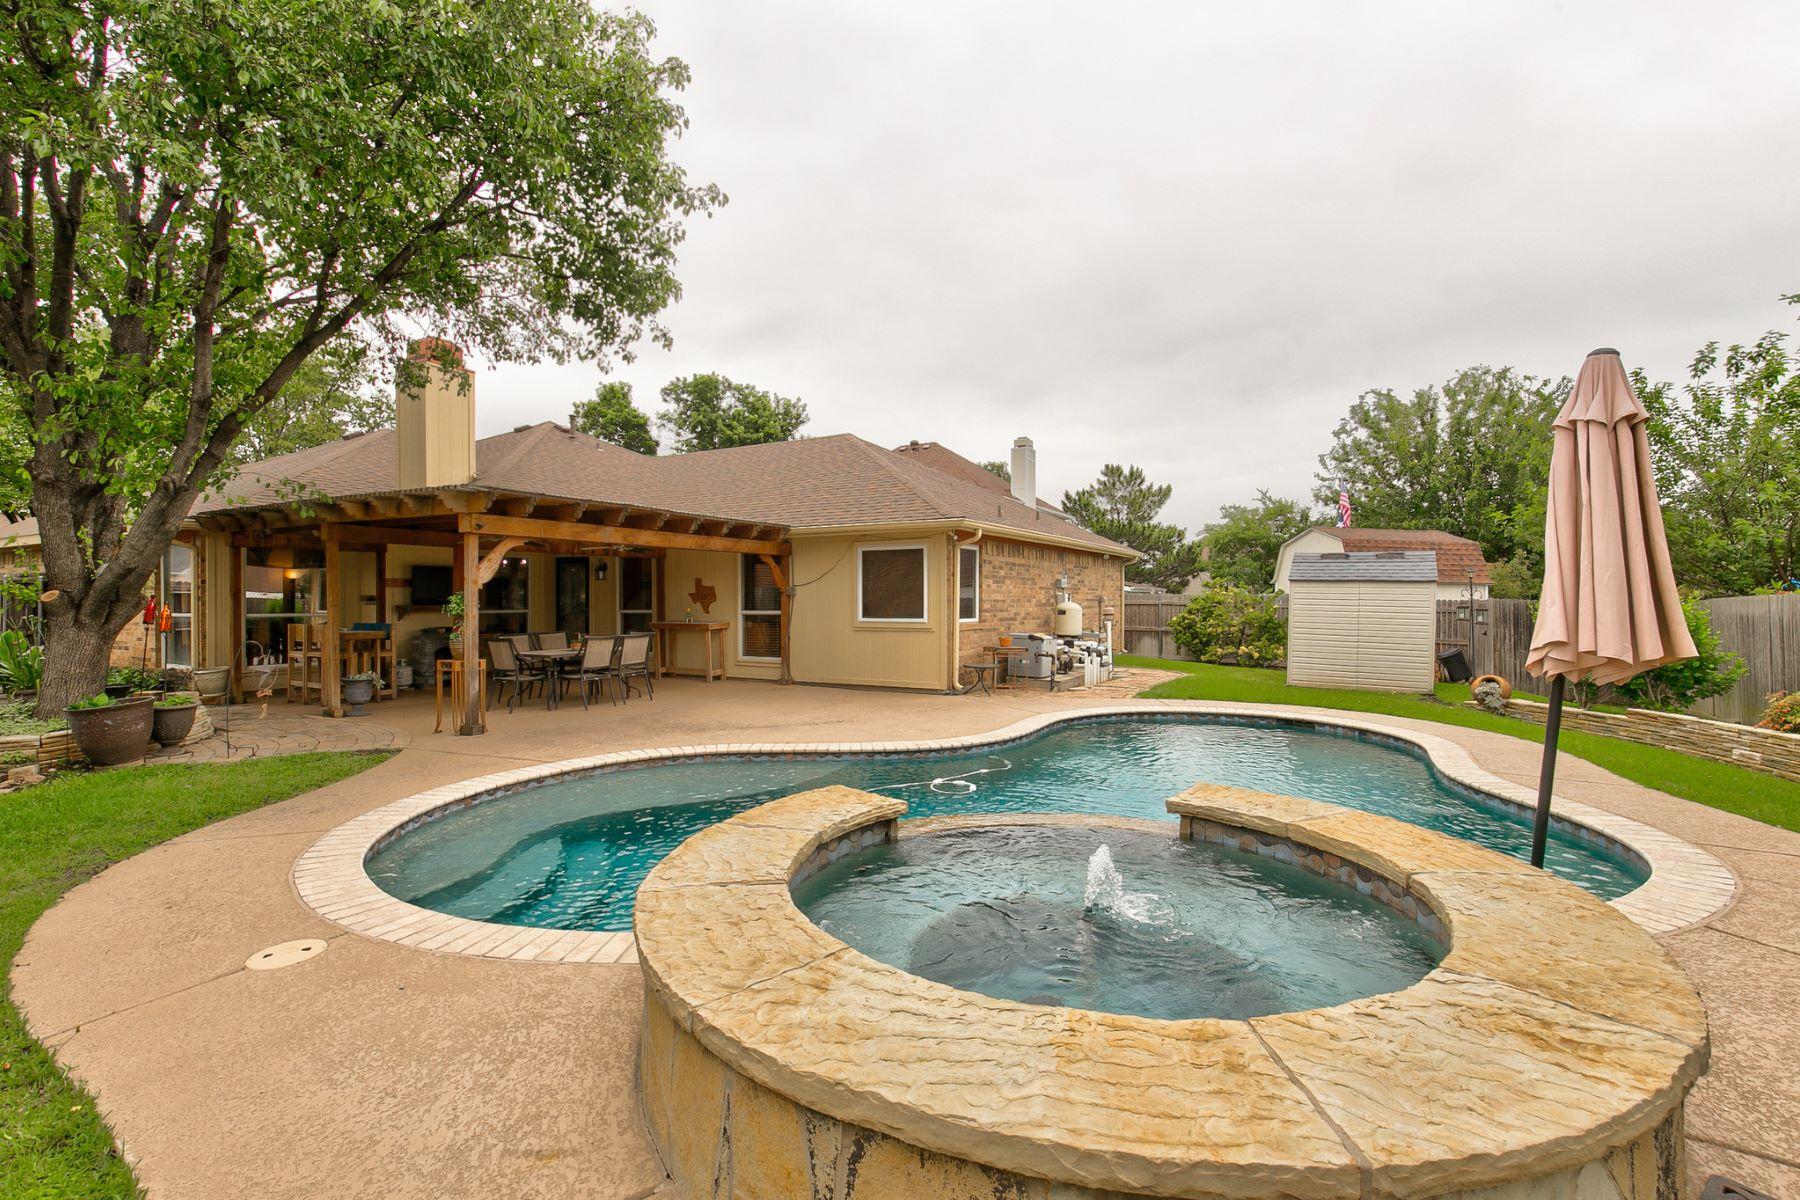 Single Family Homes for Sale at 216 Ember Glen Drive, Arlington, TX, 76018 216 Ember Glen Drive Arlington, Texas 76018 United States